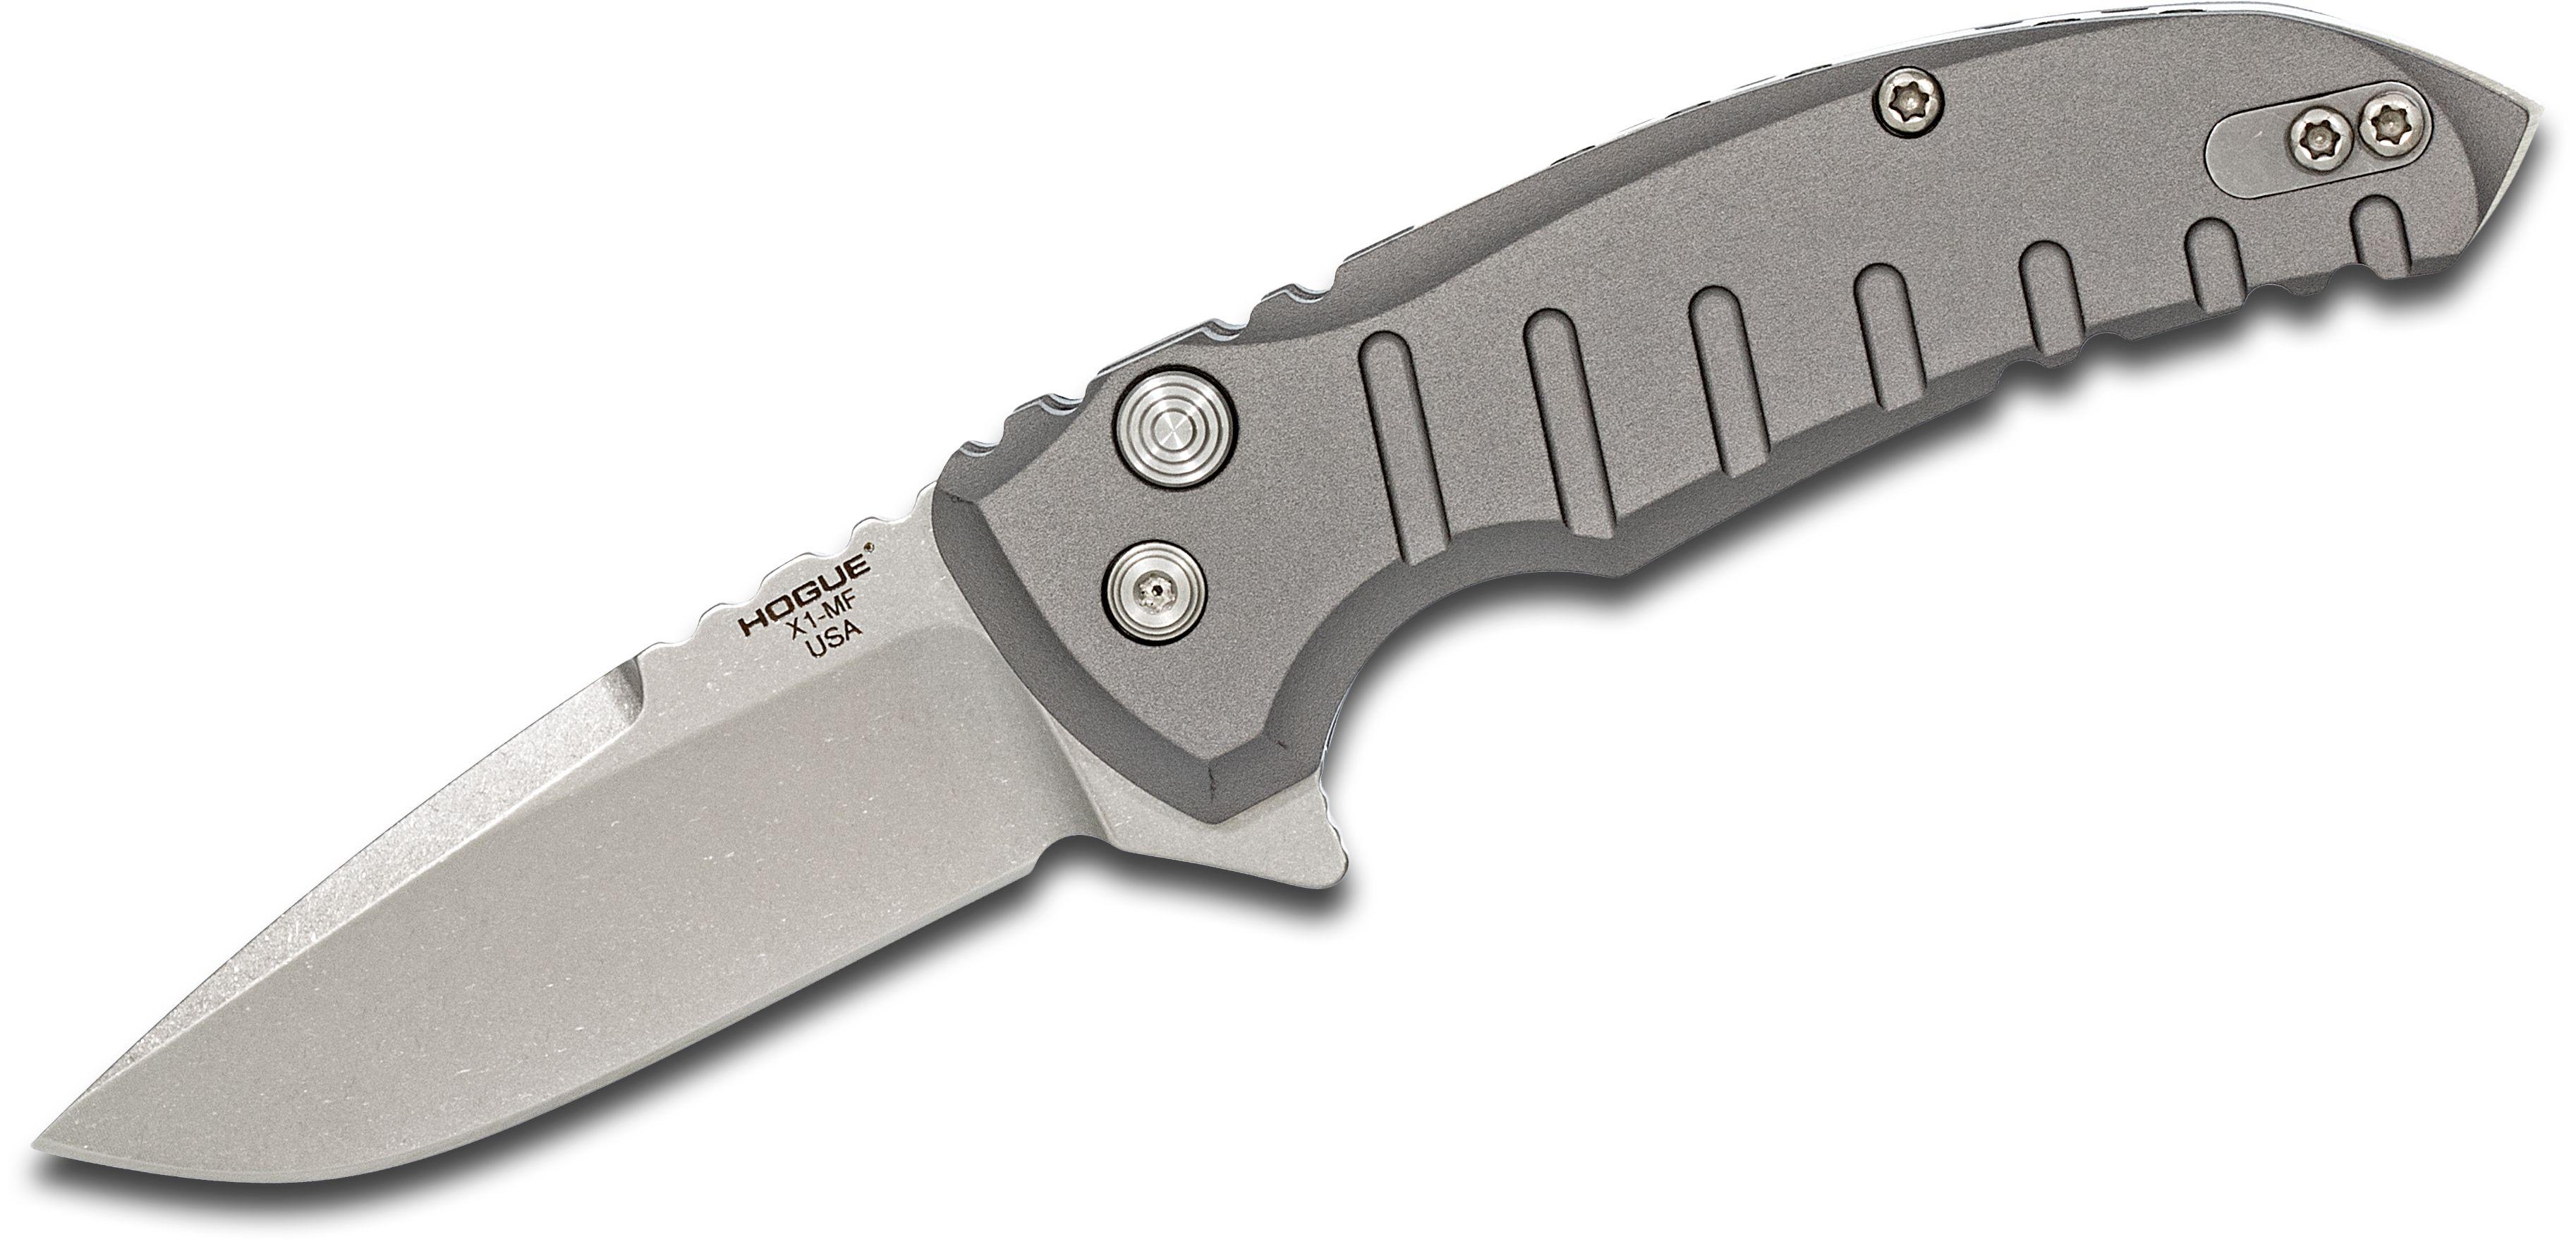 Hogue X1-Microflip Flipper 2.75 inch CPM-154 Stonewashed Blade, Matte Gray Aluminum Handles